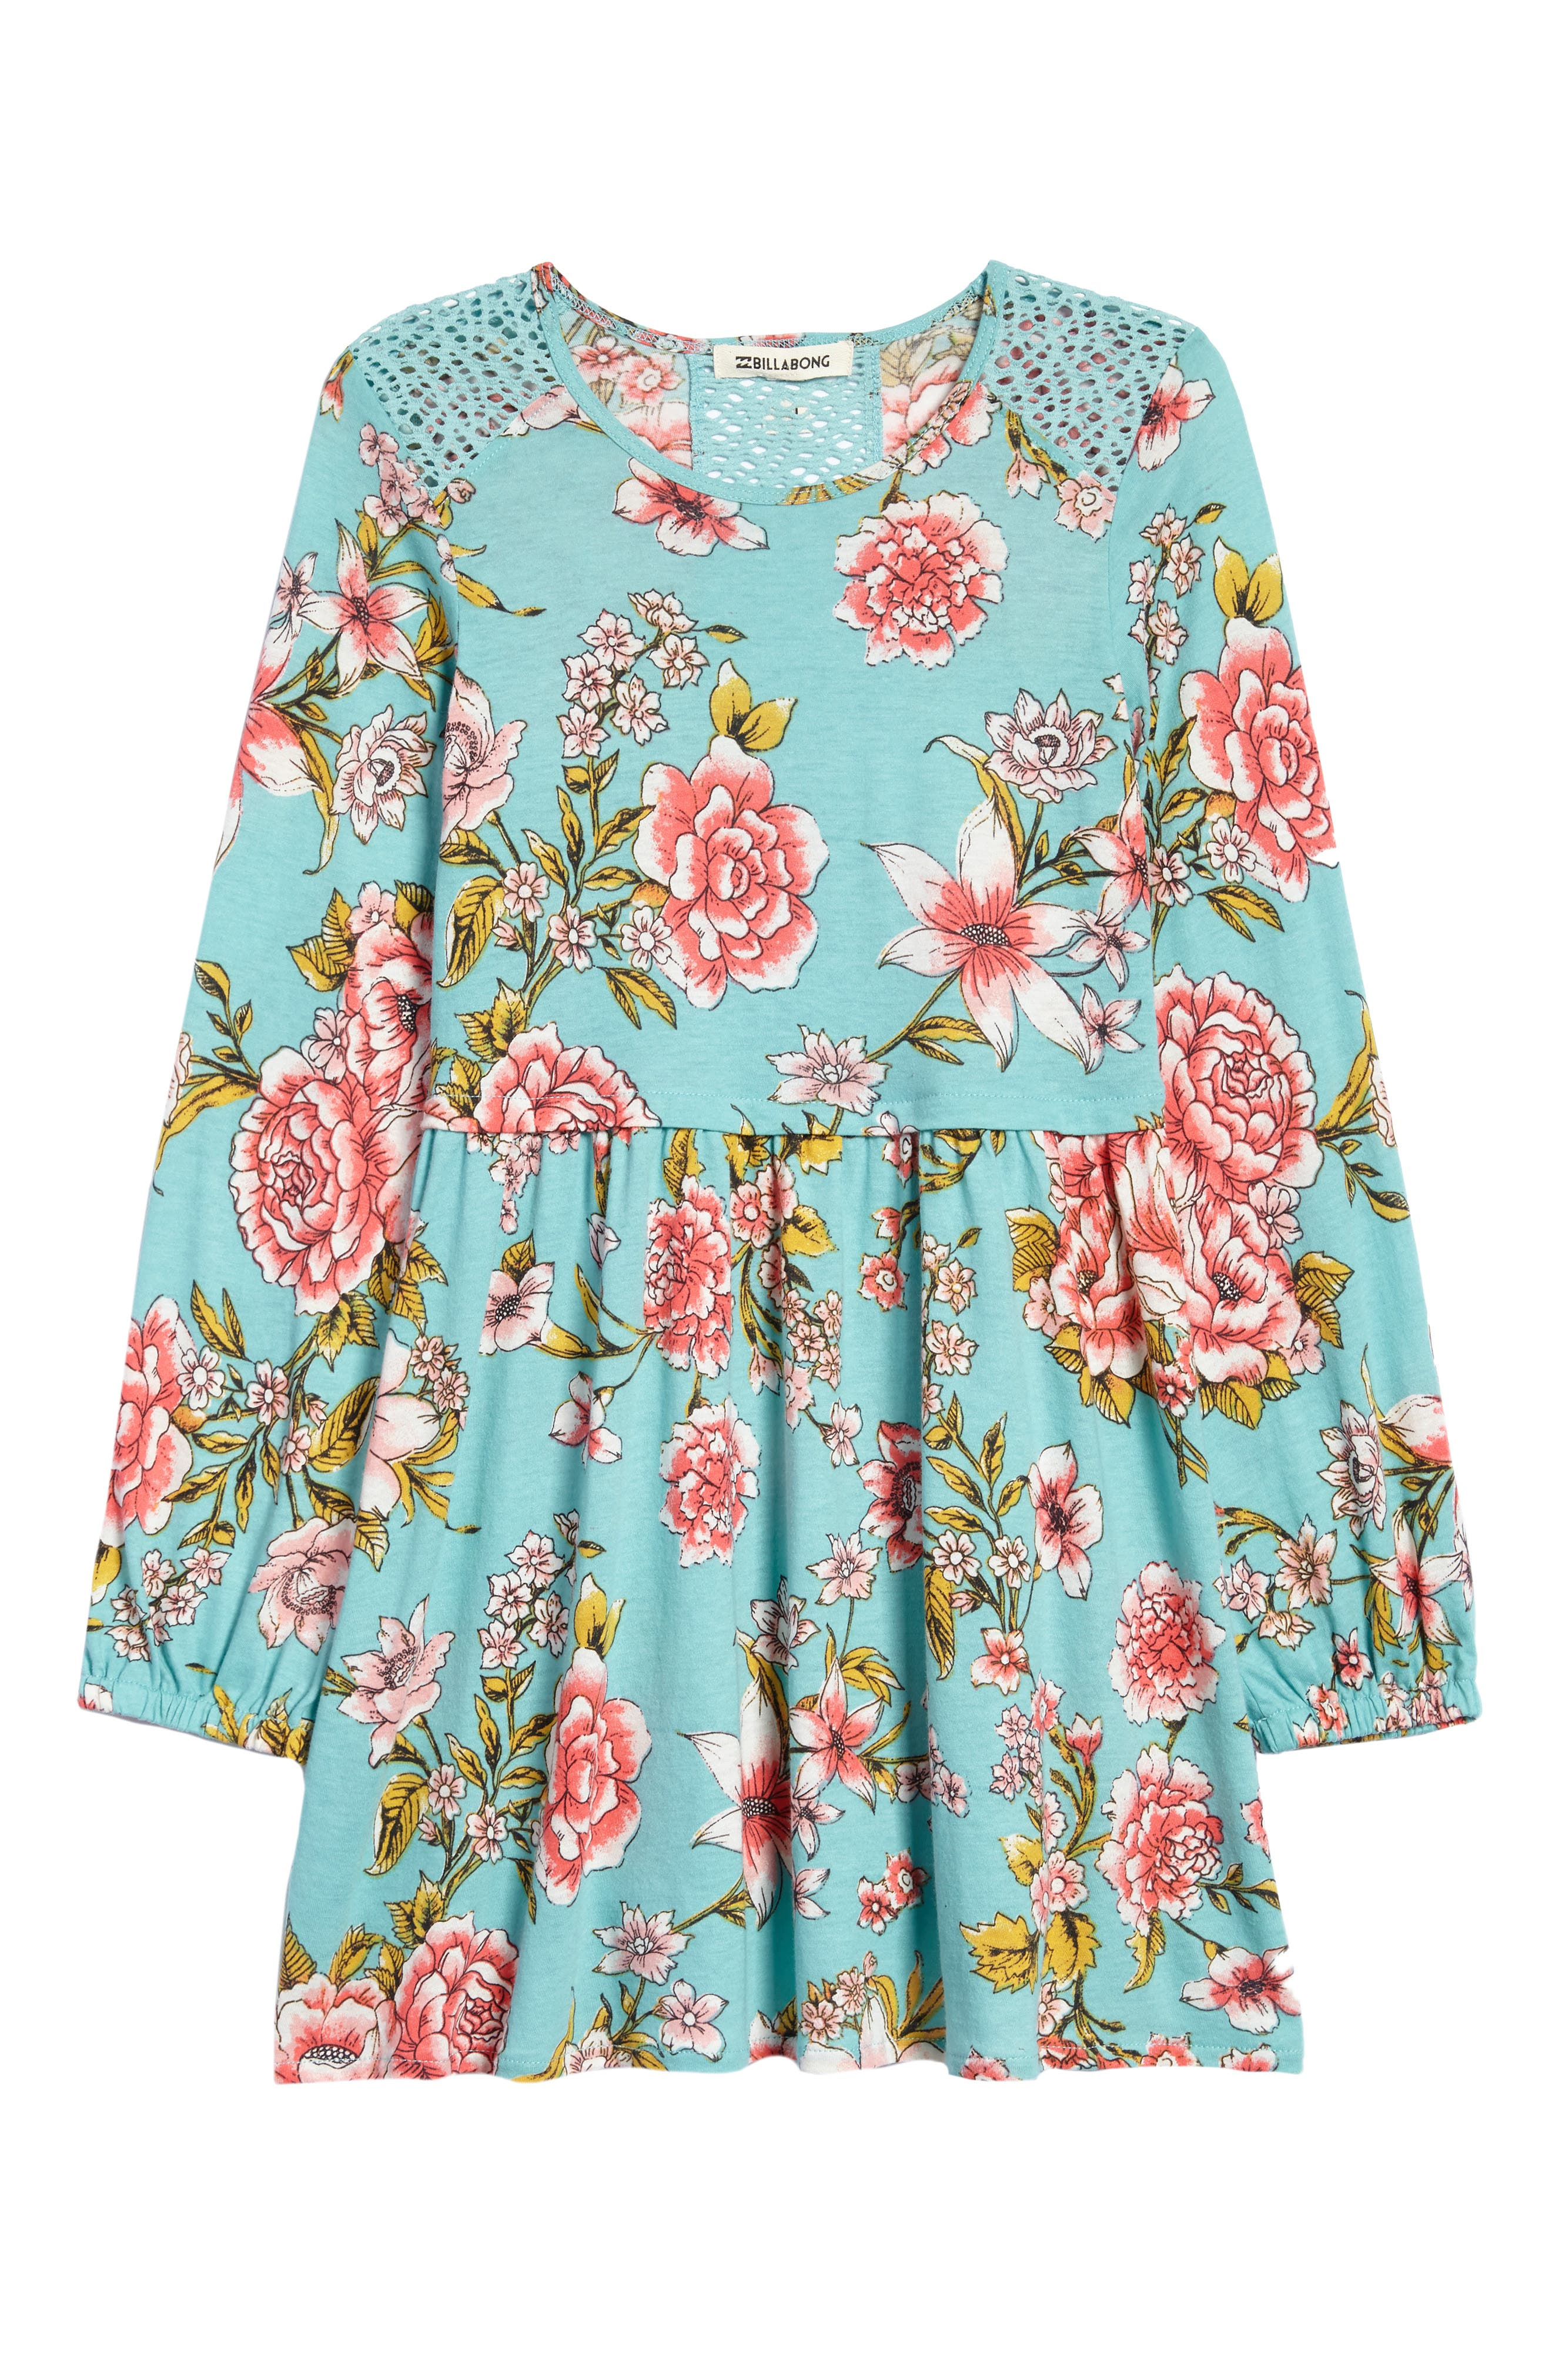 Me Oh My Dress,                             Main thumbnail 1, color,                             446